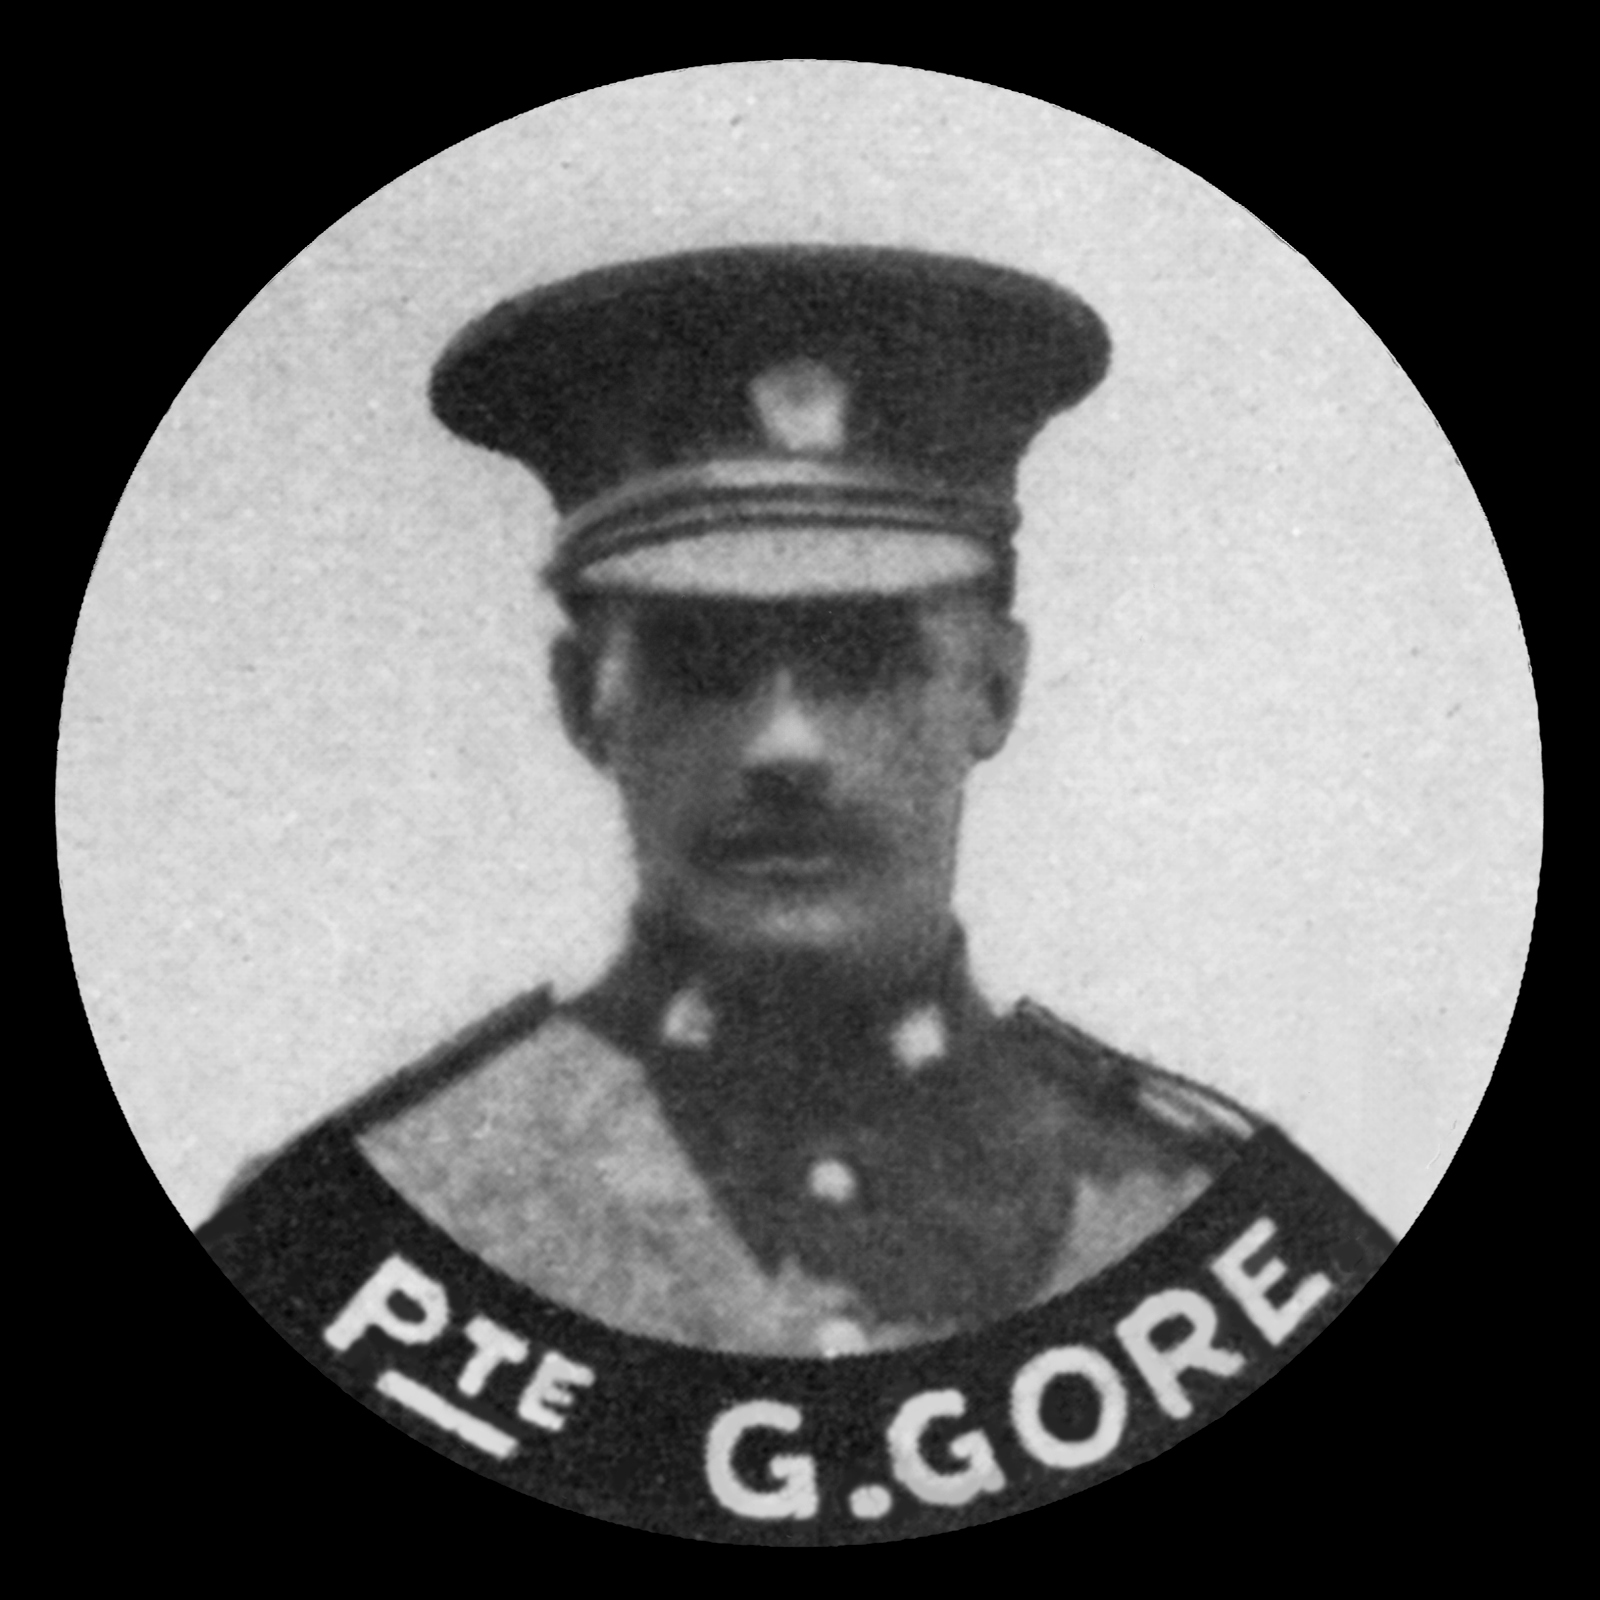 GORE George